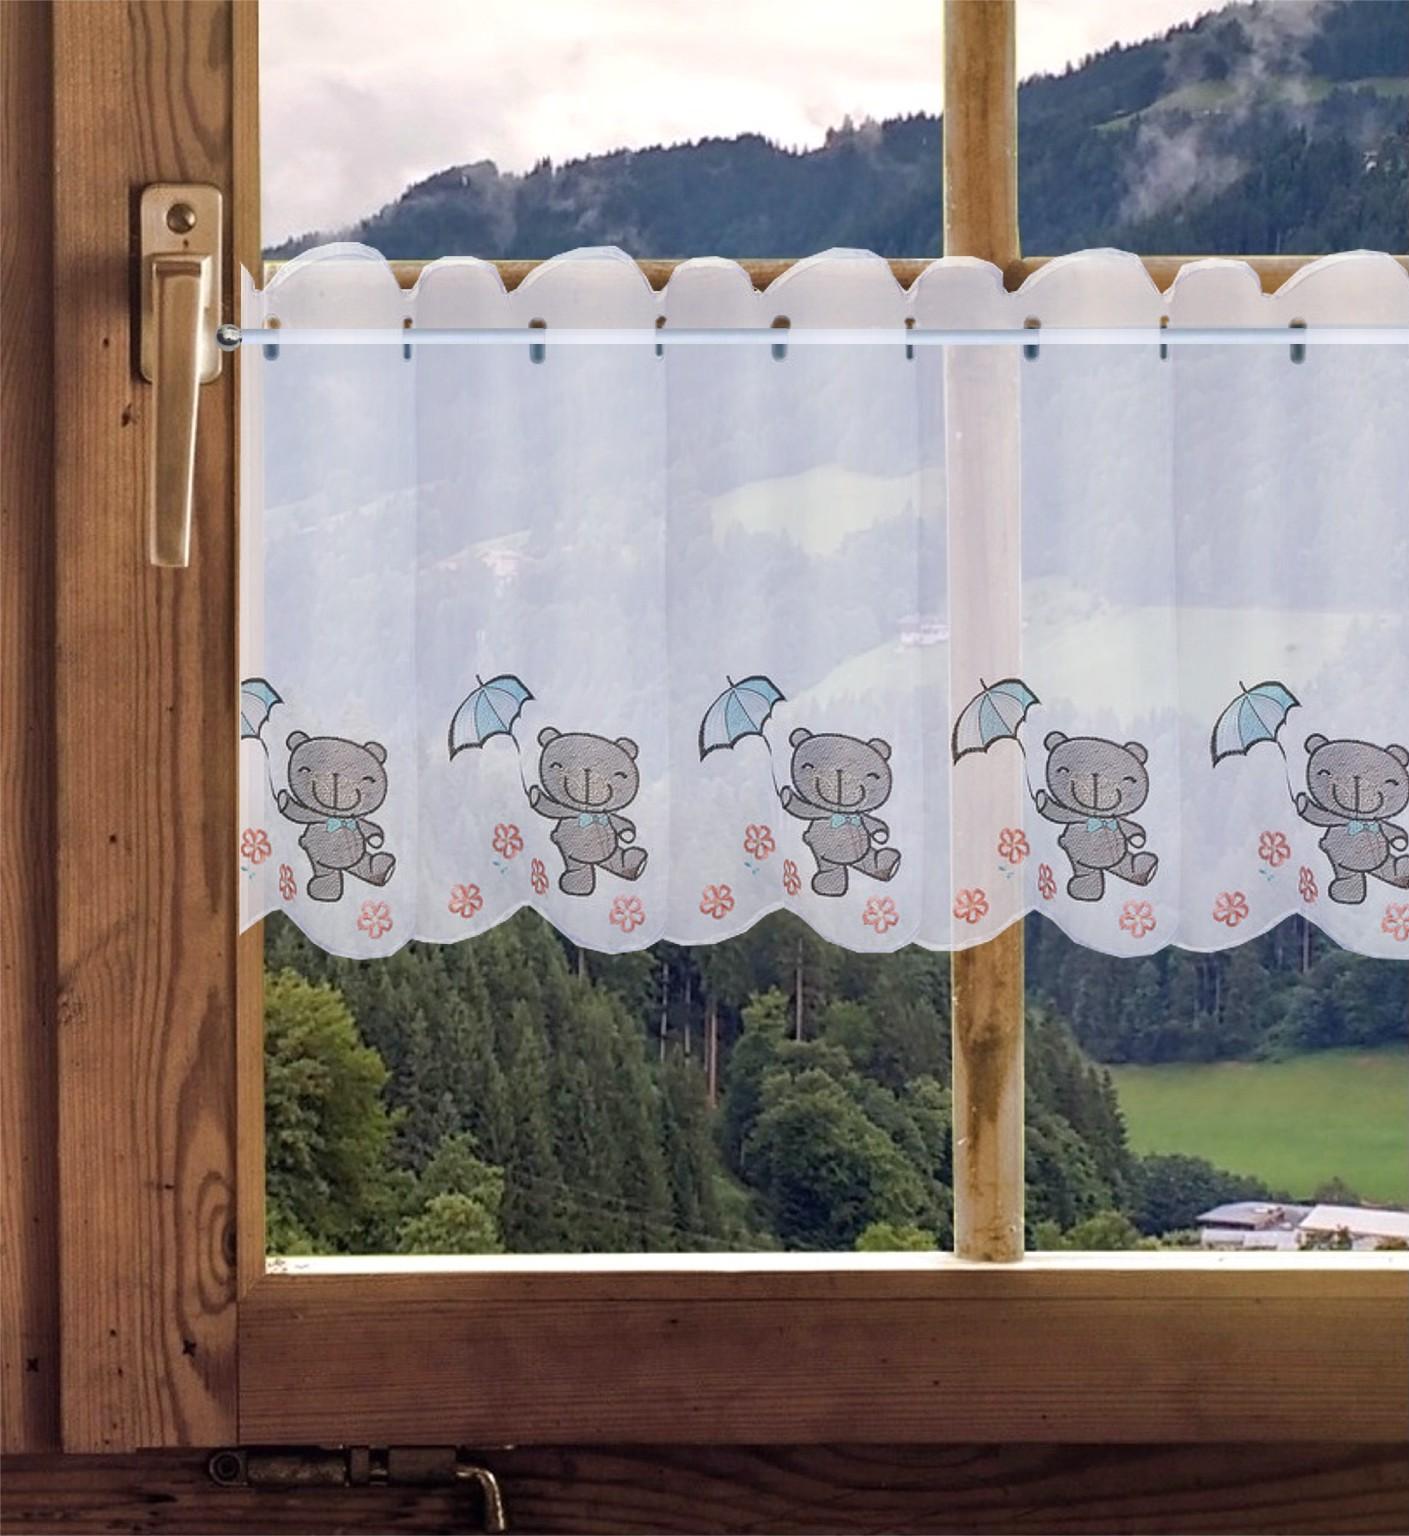 Full Size of Gardinen Welt Online Shop Bestickte Scheibengardine Teddy Kinderzimmer Regal Sofa Weiß Regale Scheibengardinen Küche Kinderzimmer Scheibengardinen Kinderzimmer